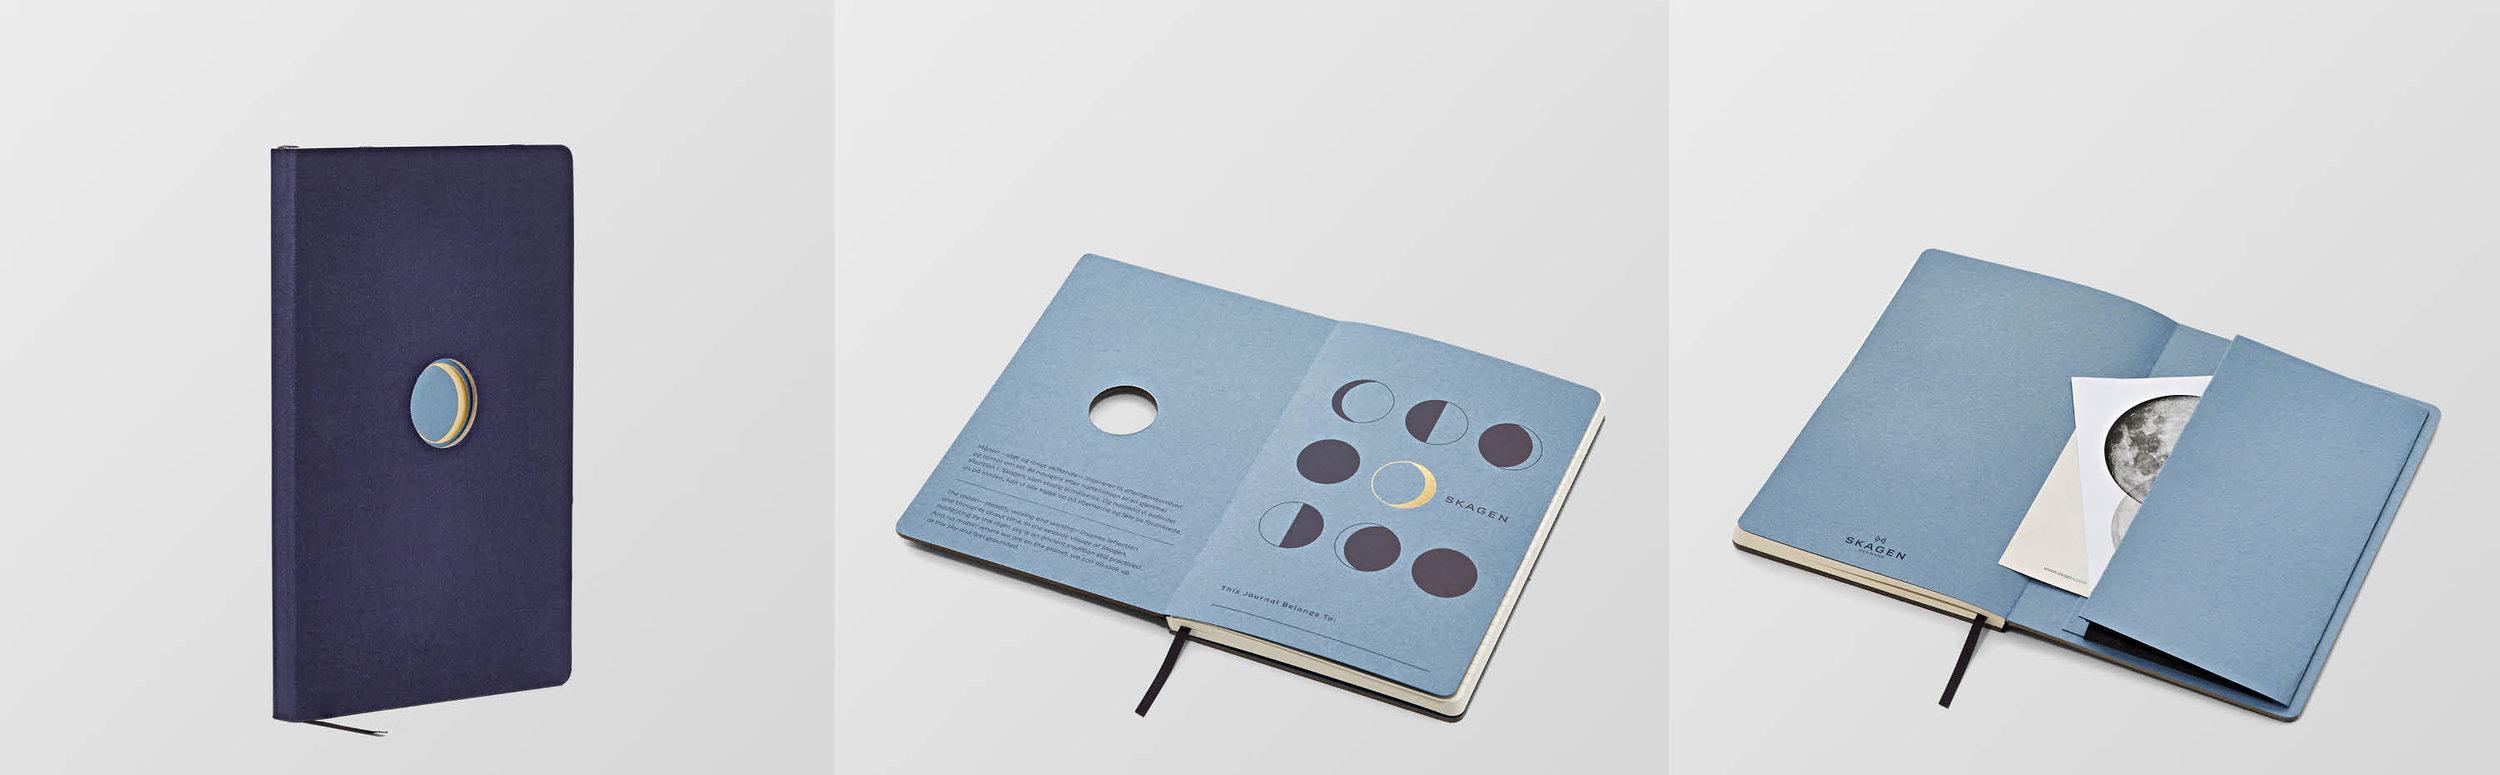 ProductDesign-StationeryGifts-025.jpg